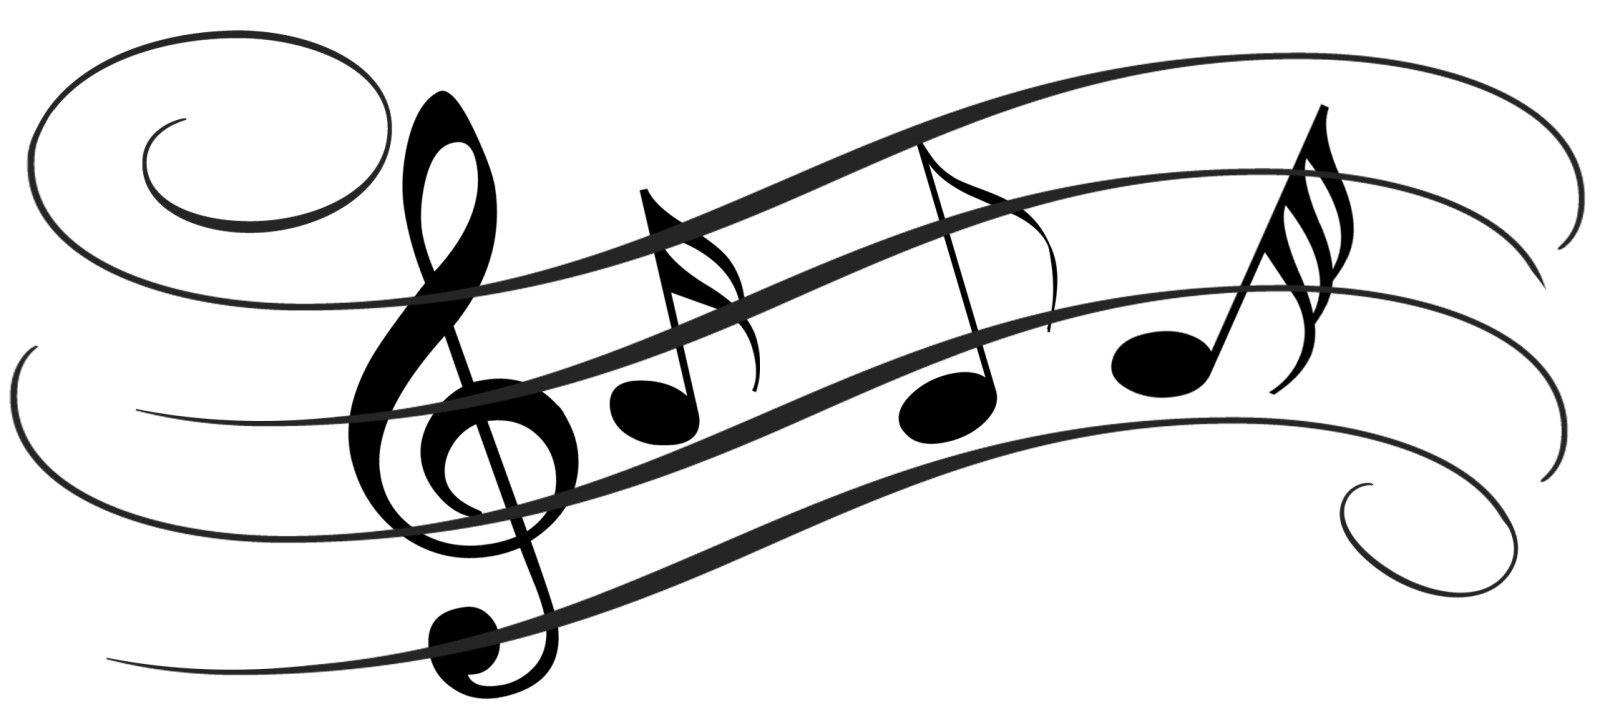 notas musicais - Pesquisa Google | rober | Pinterest